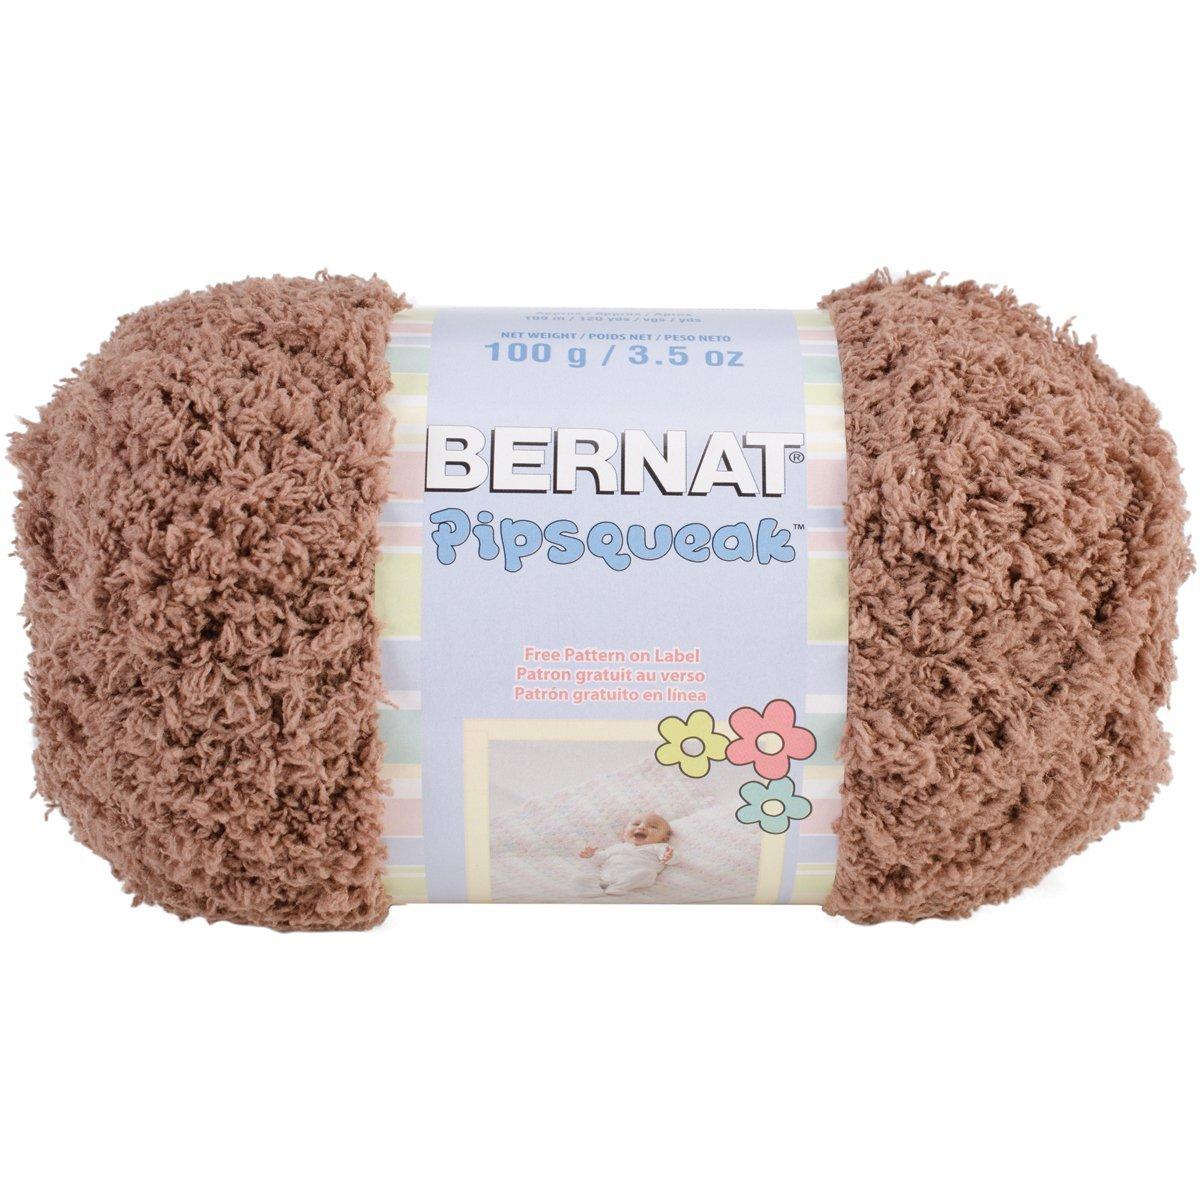 Bernat Pipsqueak Yarn-100g-Chocolate, Single Ball